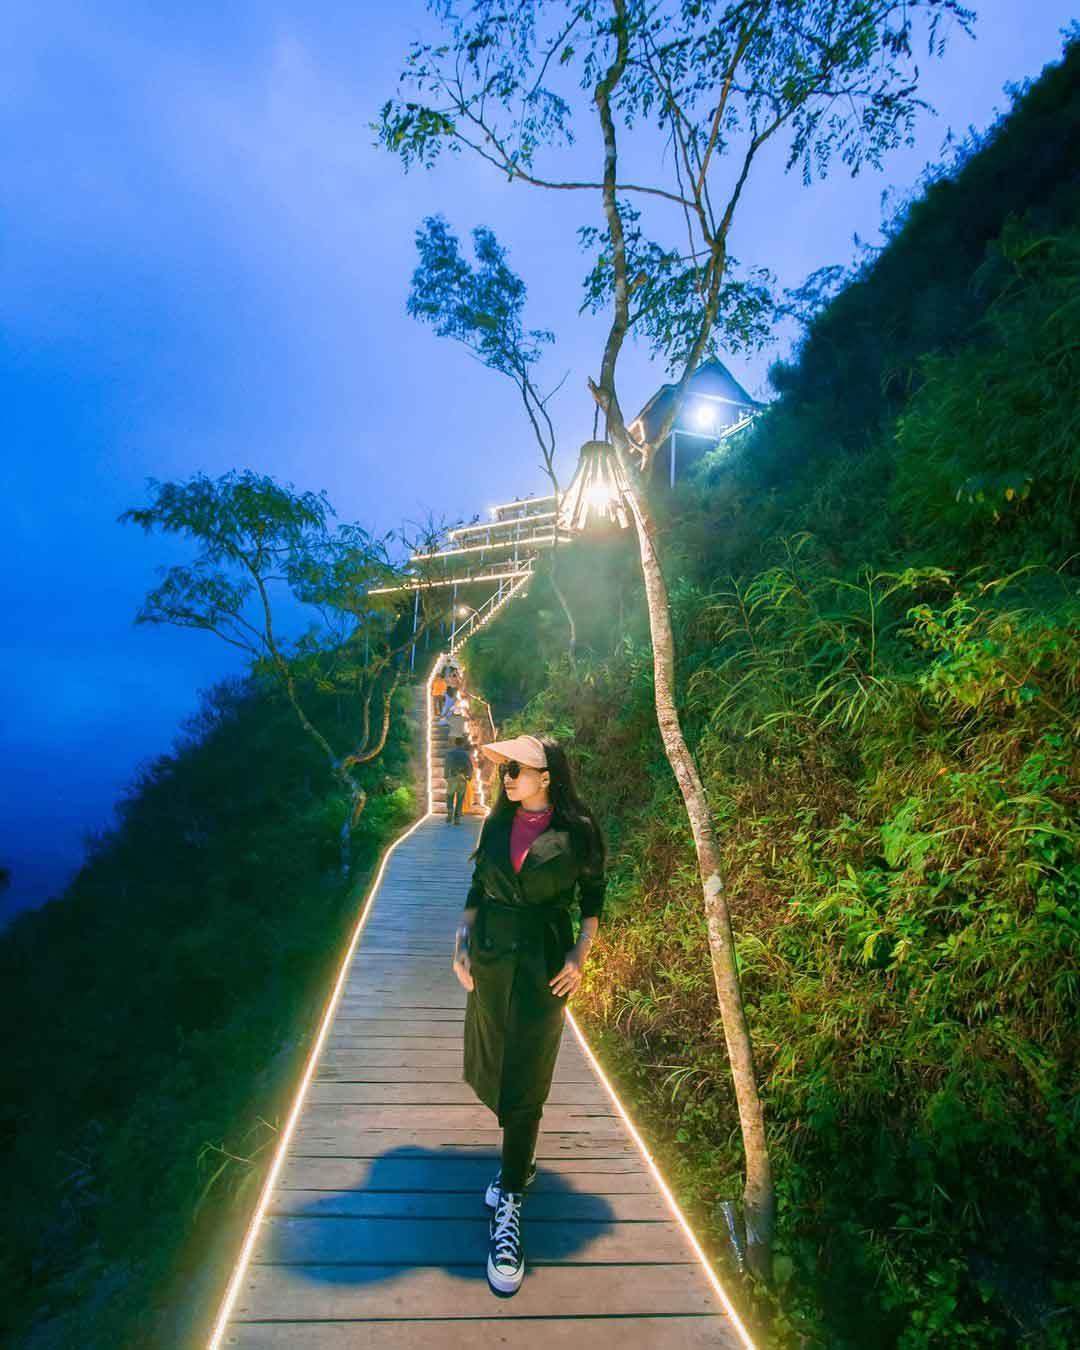 Lampu Lampu LED Di Tumpeng Menoreh Jogja Image From @yayukjuminten